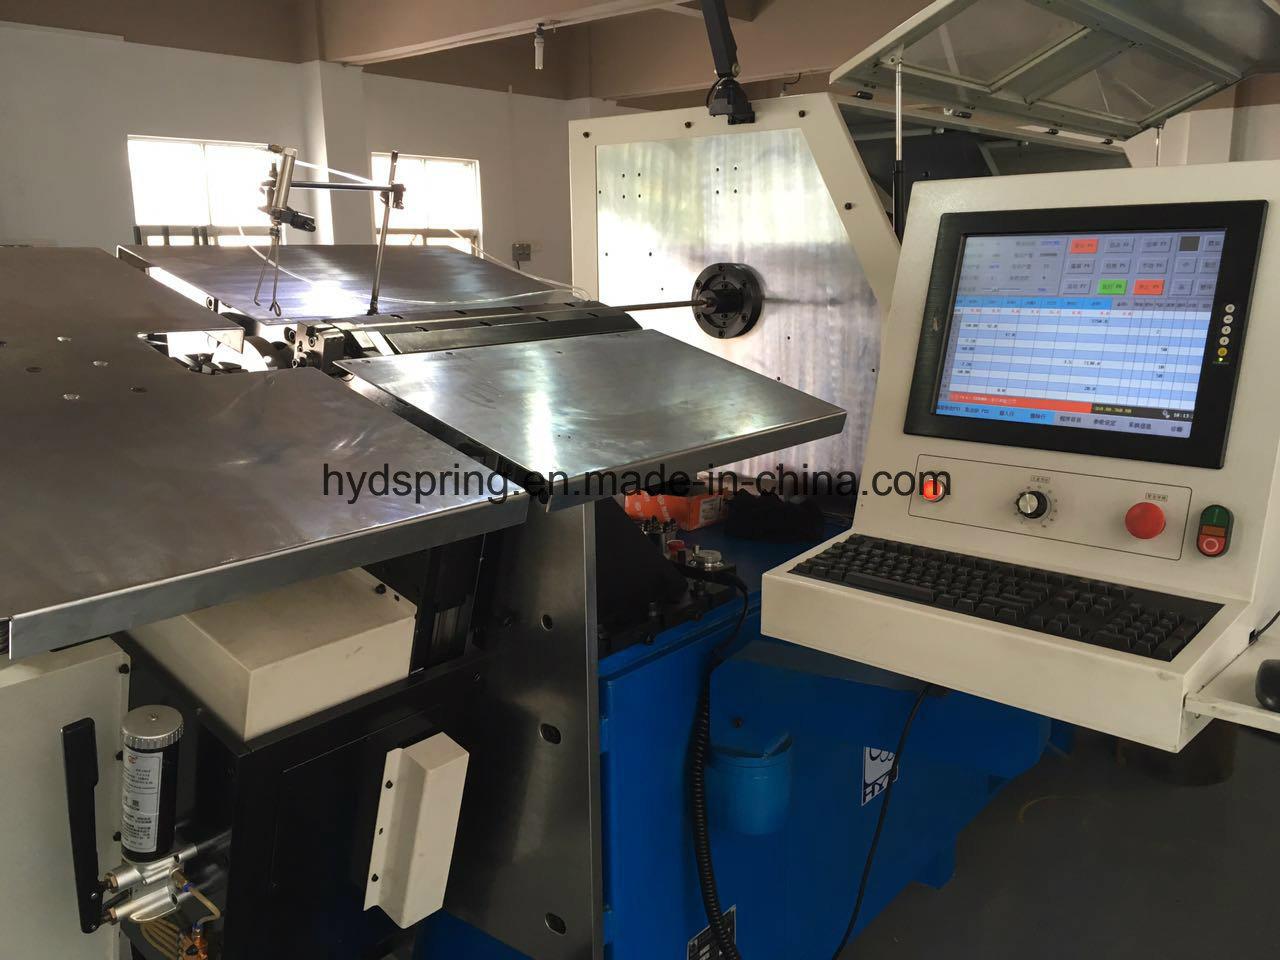 New Machine Hyd-60-10A Automatic Wire Bending Machine & Spring Machine